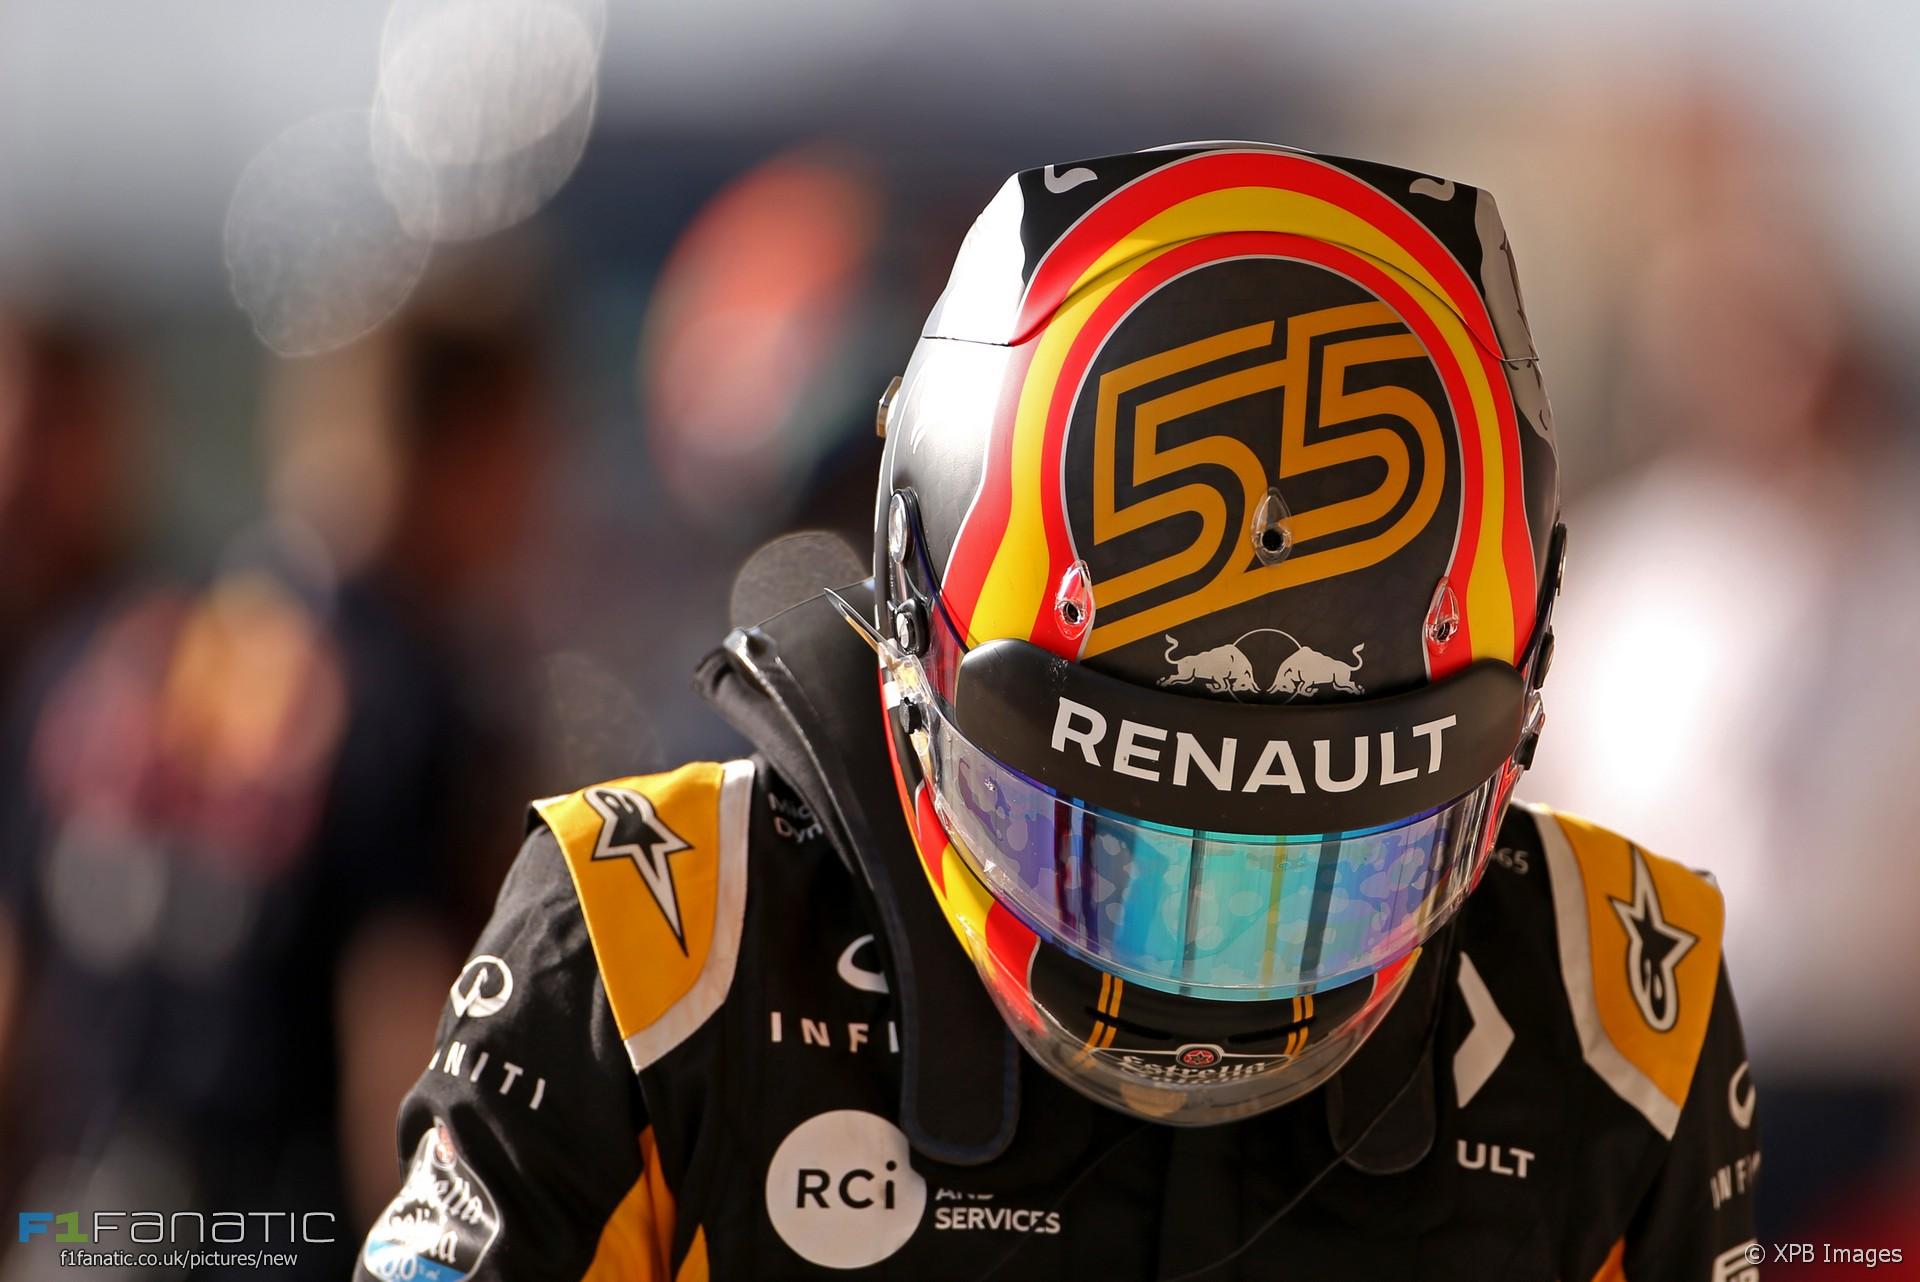 Carlos Sainz Jnr, Renault, Circuit of the Americas, 2017